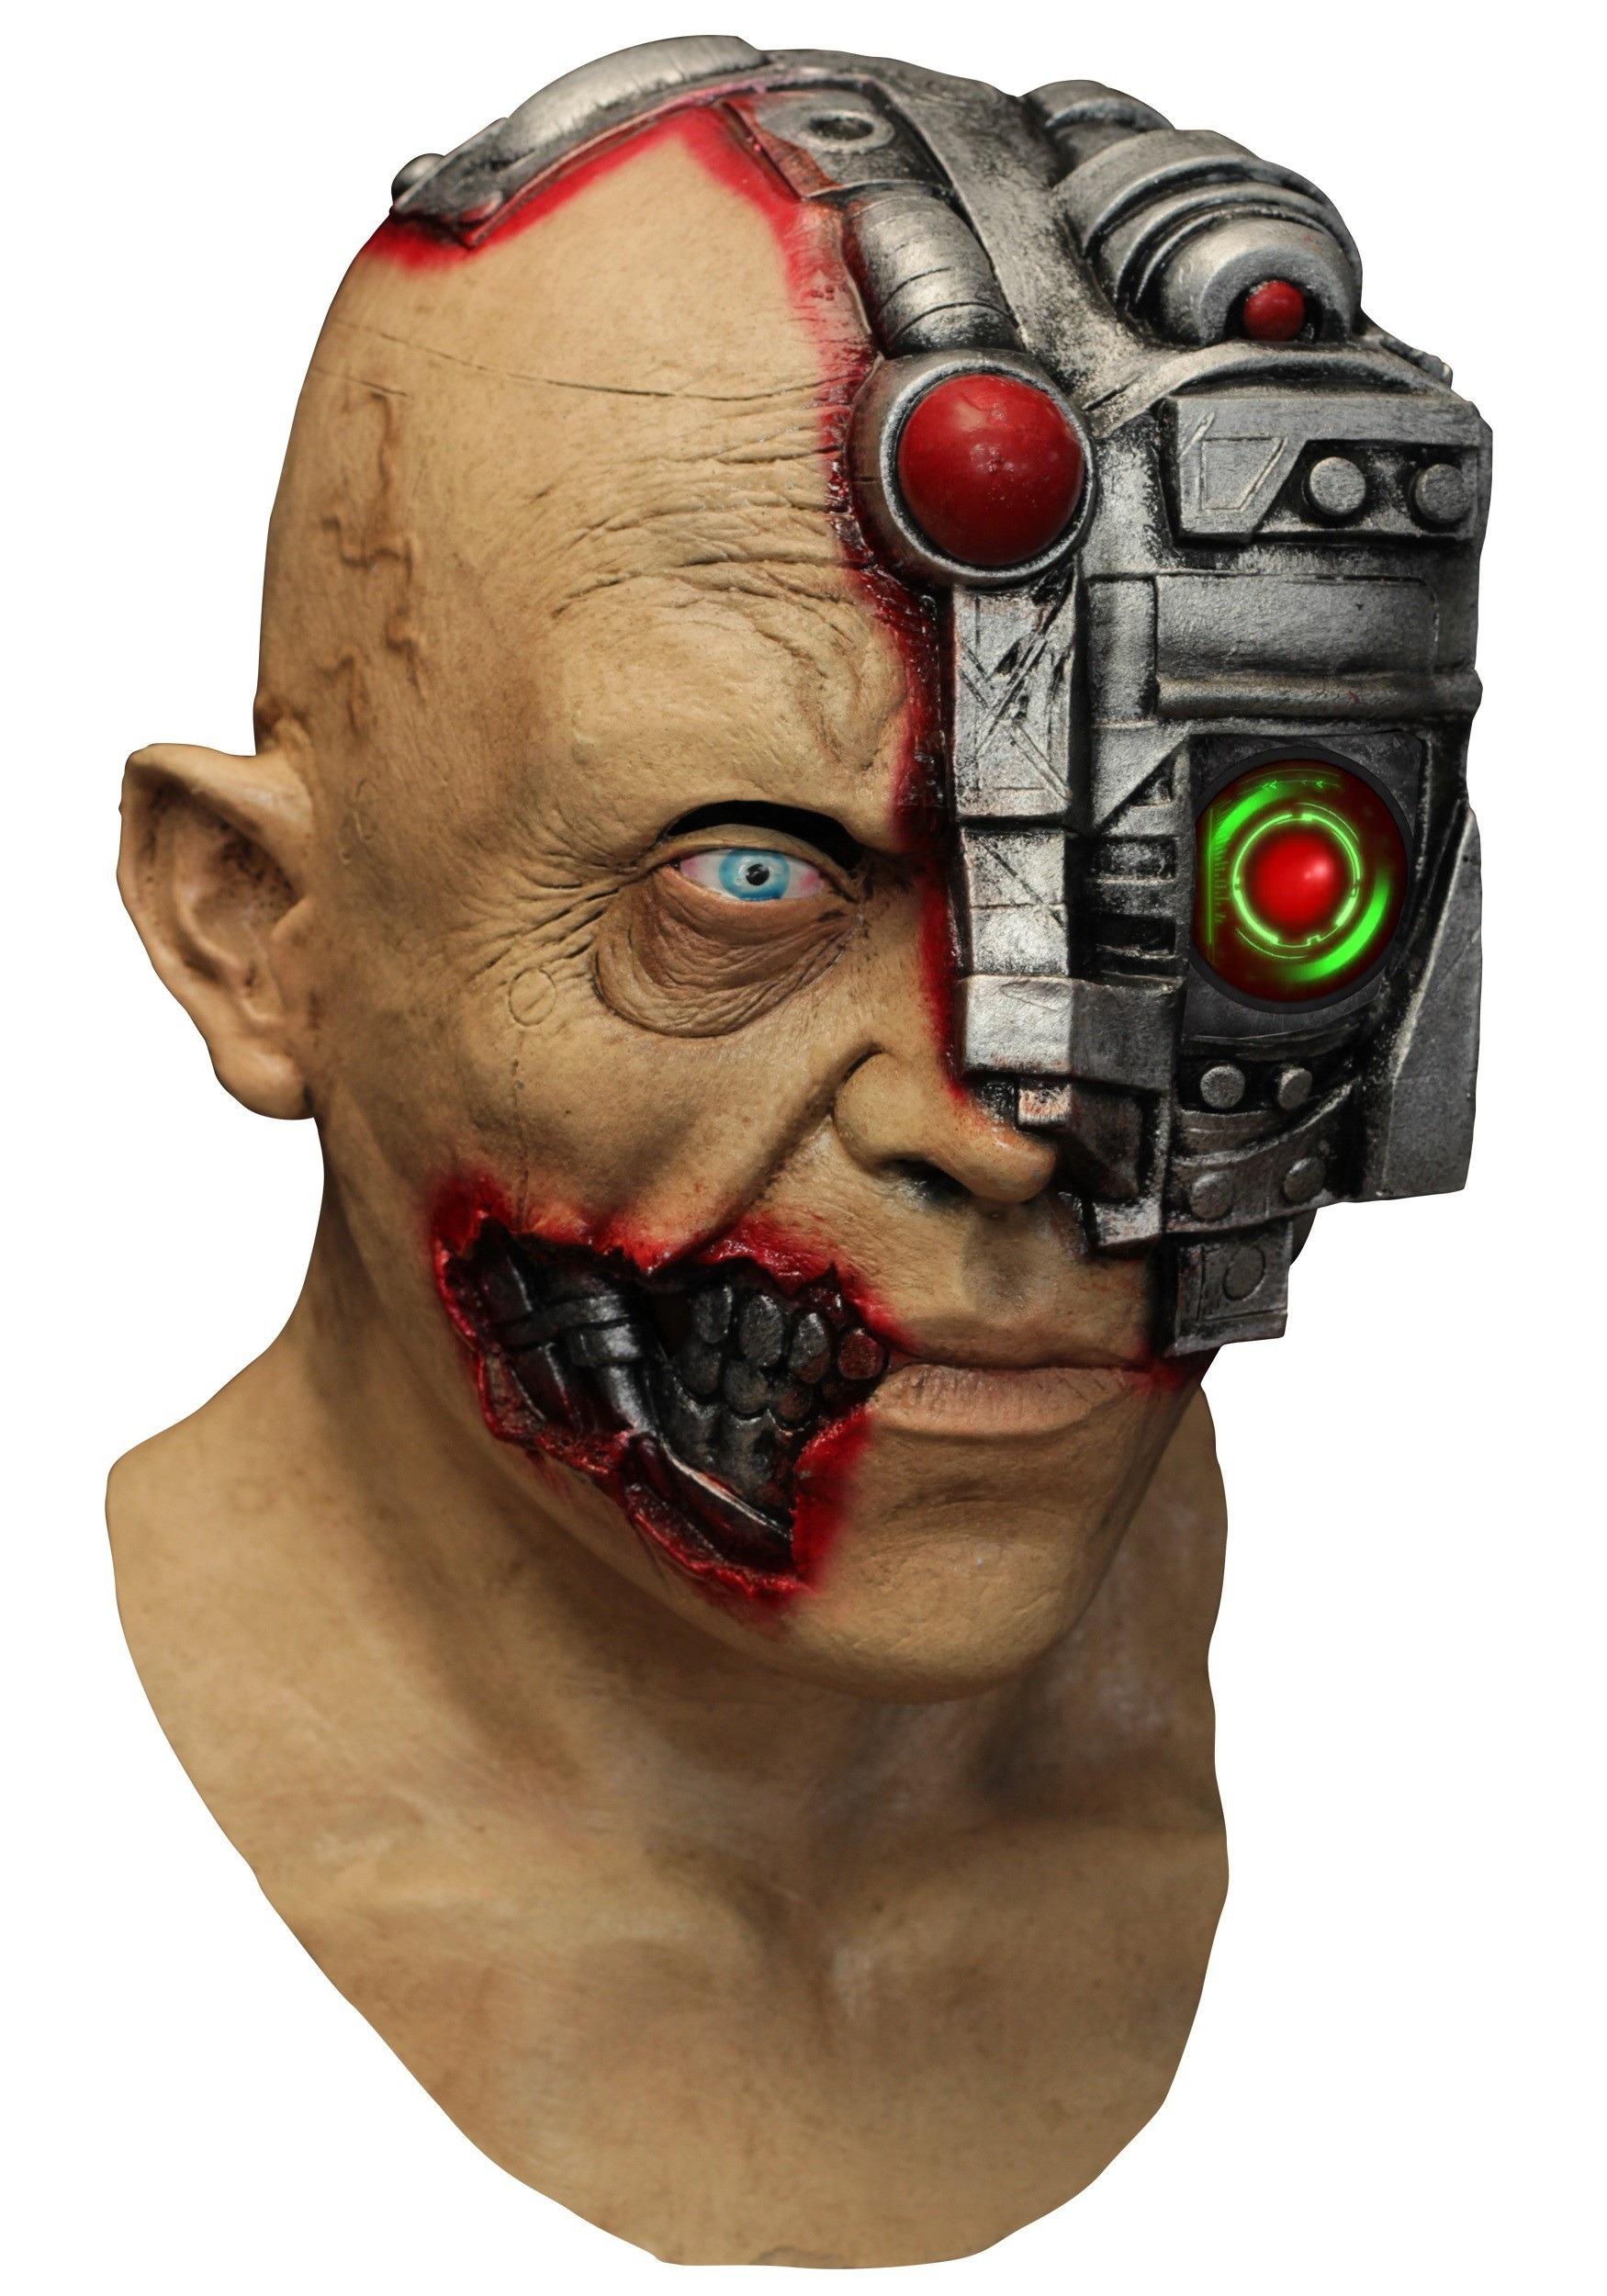 Robot Costumes & Cyborg Masks - HalloweenCostumes.com